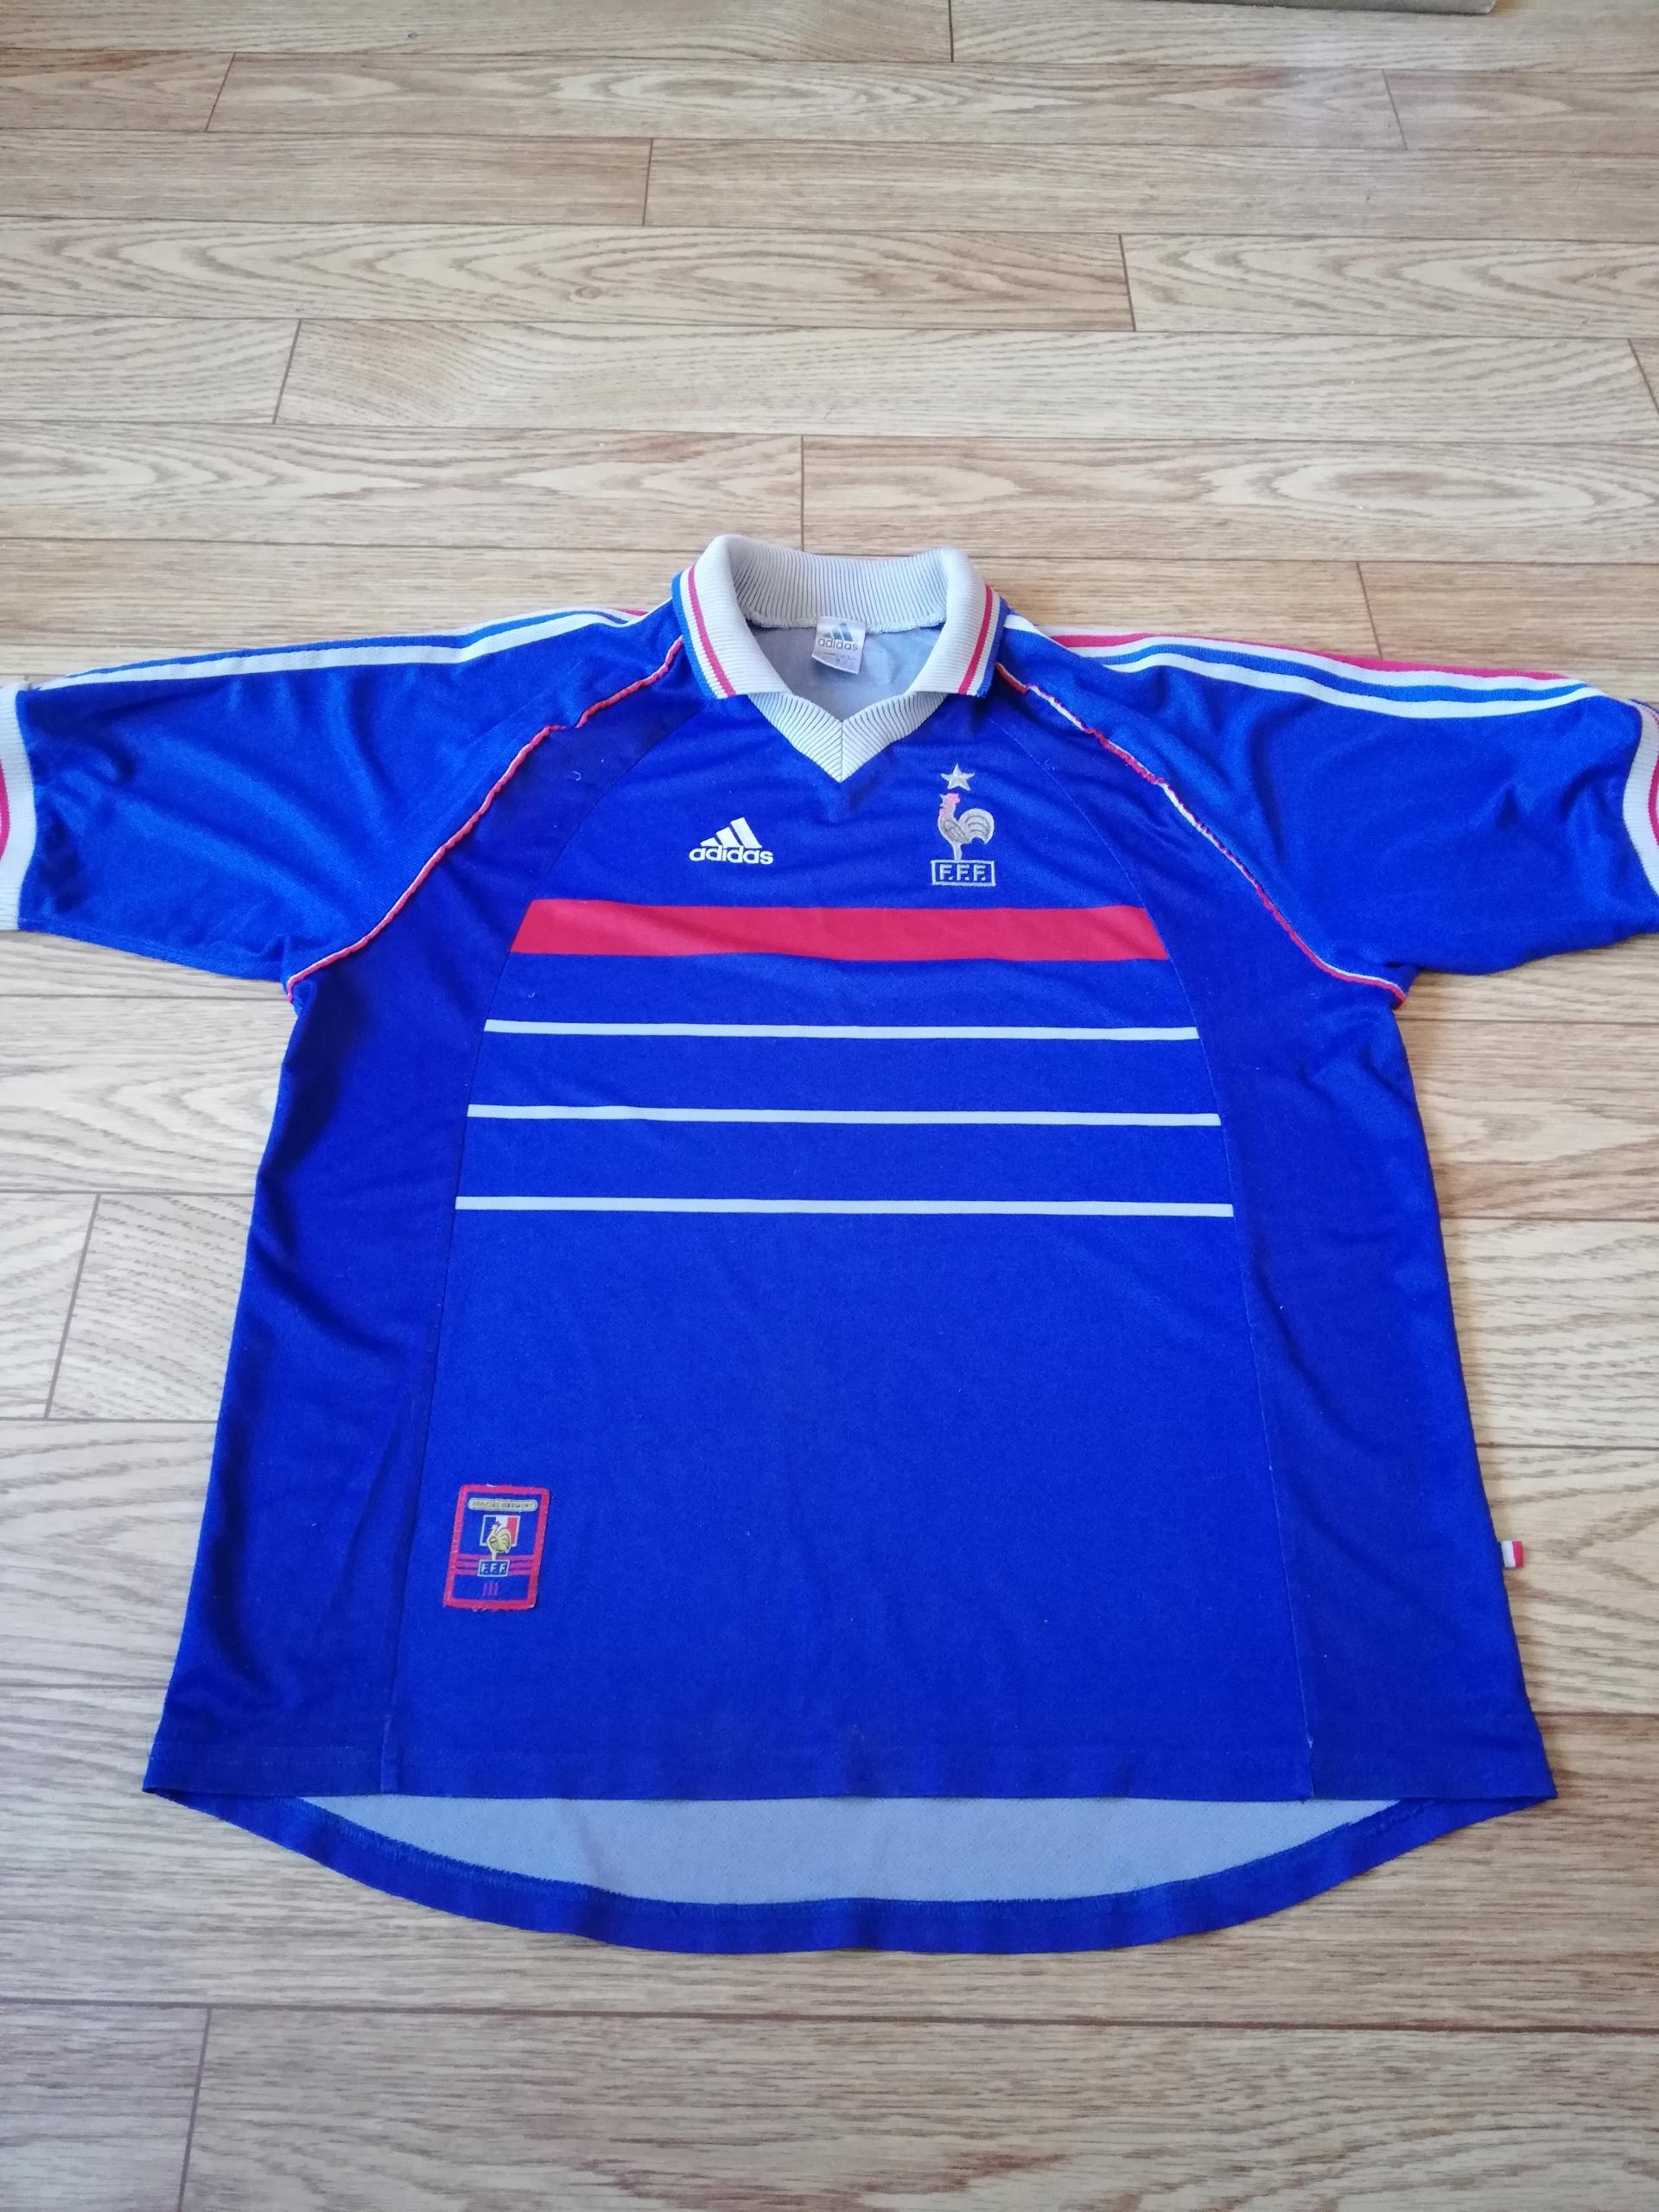 France Home football shirt 1997 - 1998